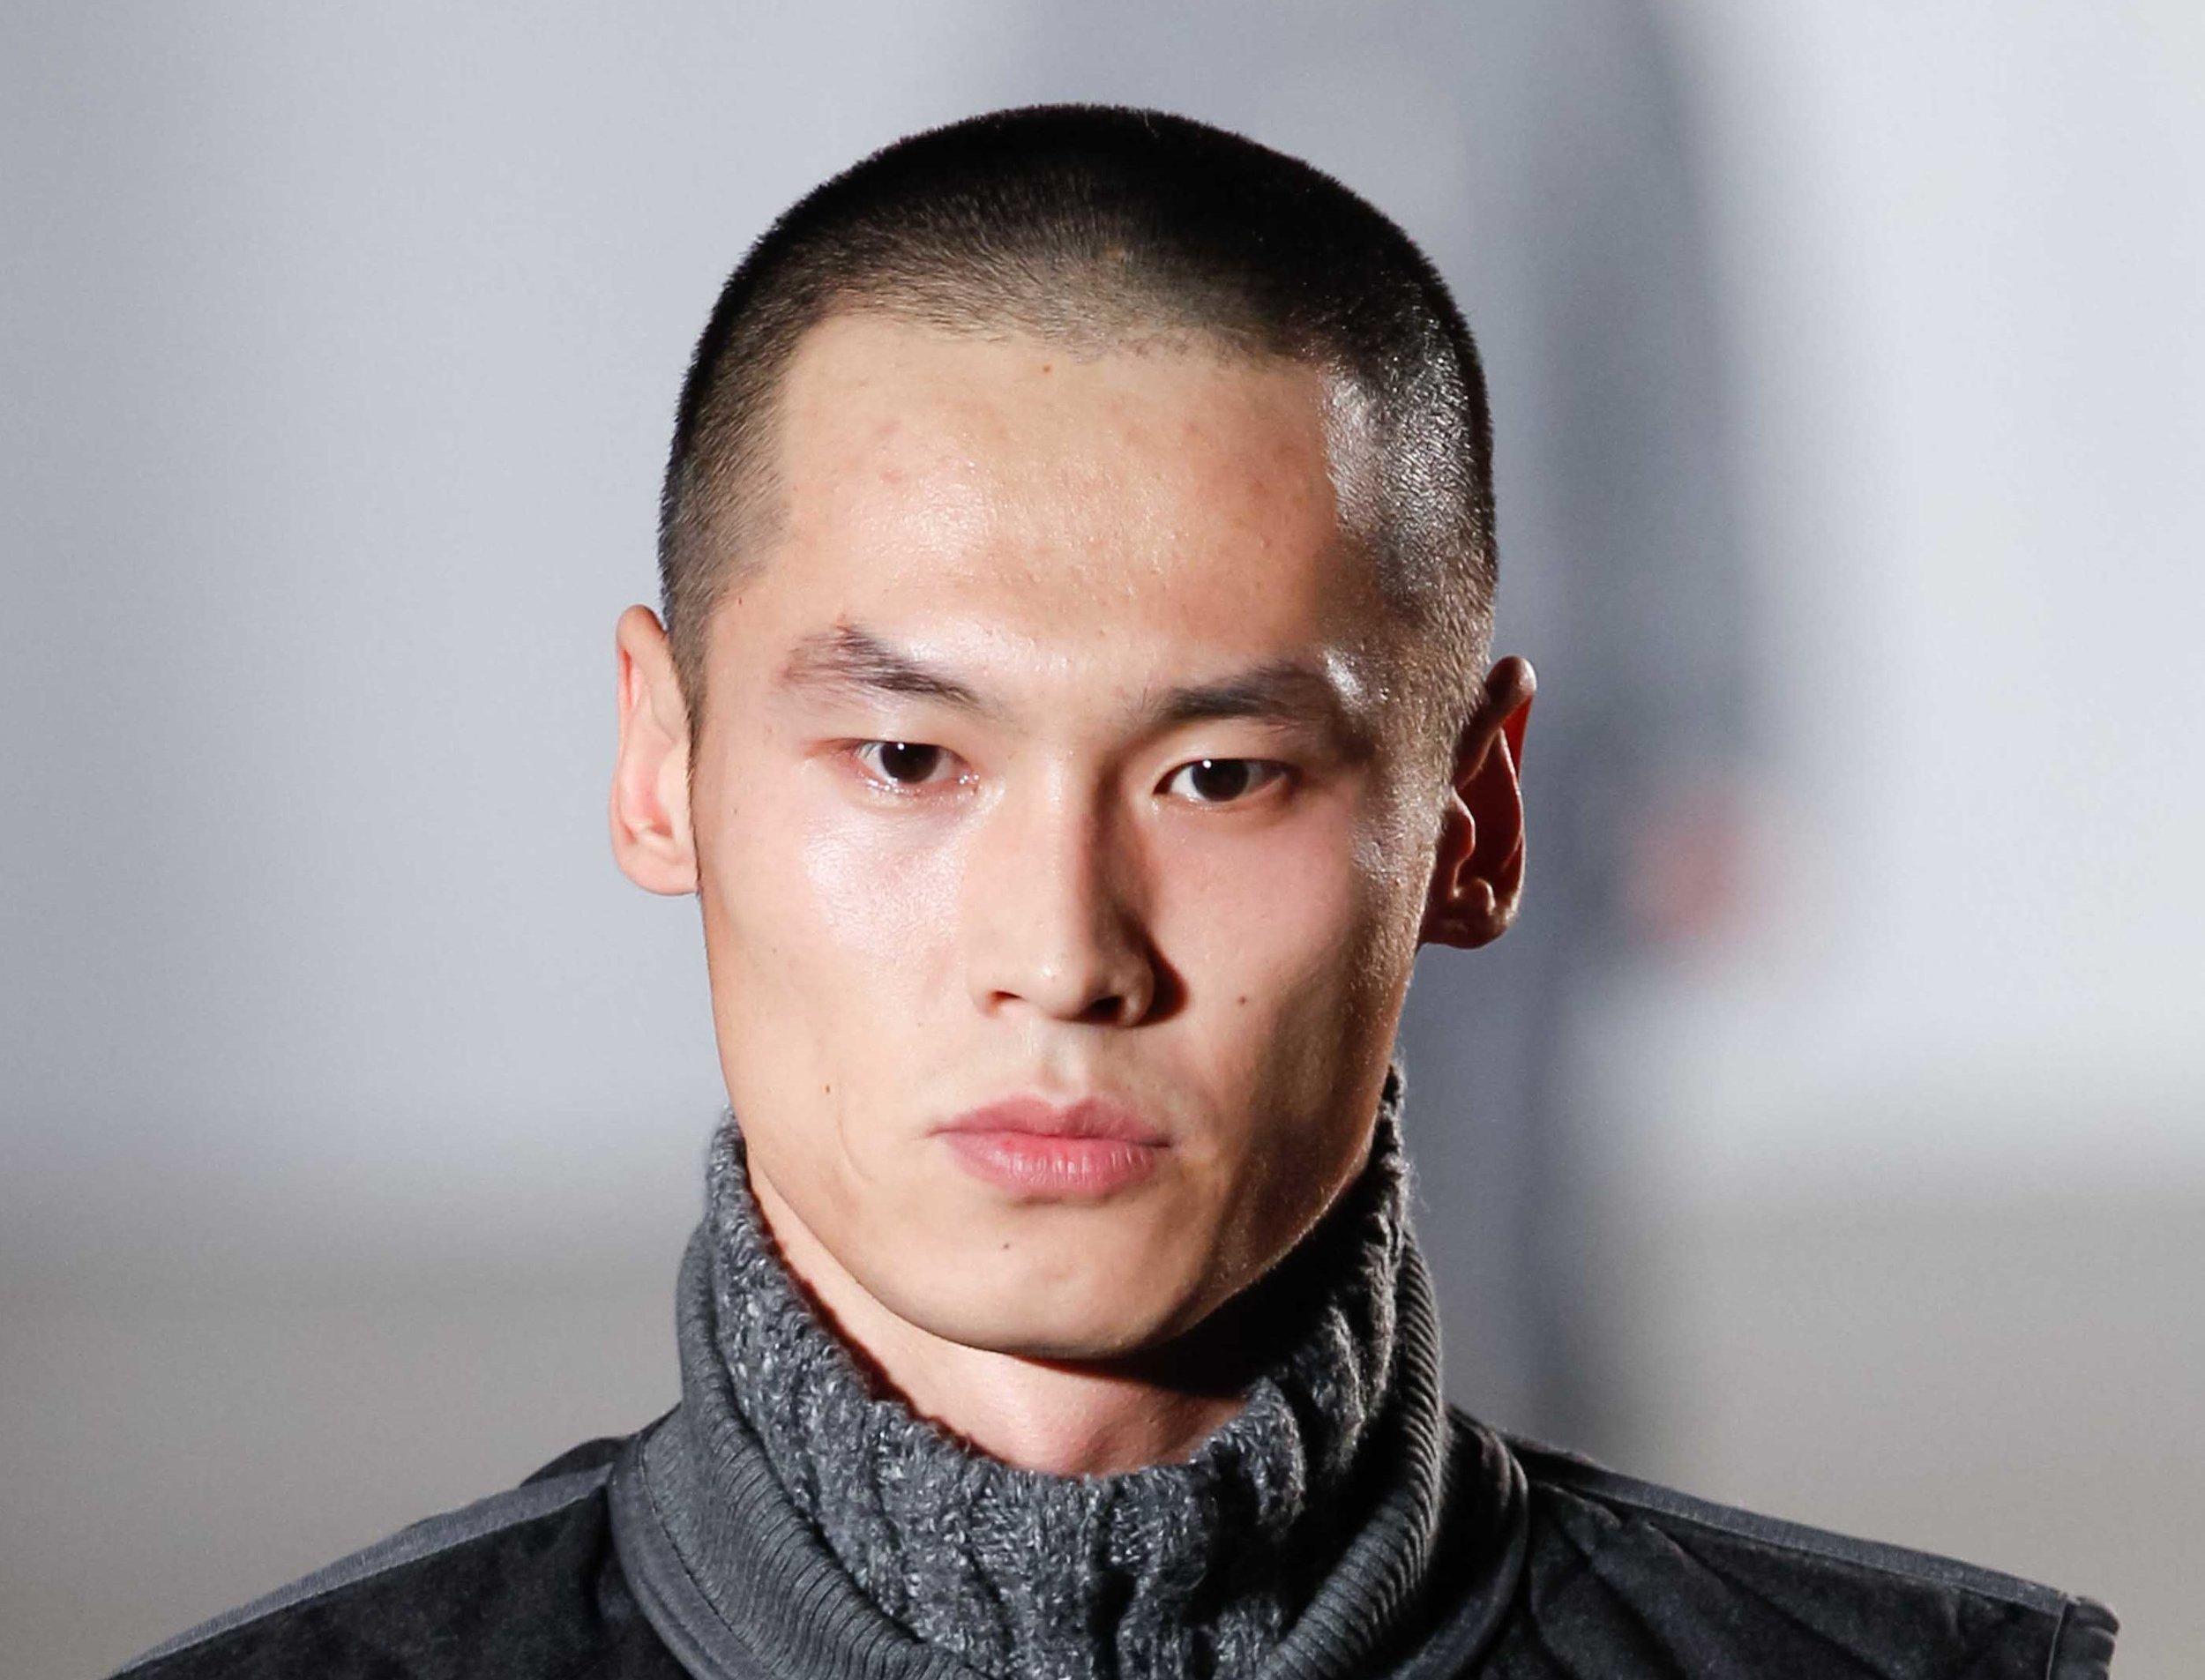 short-asian-mens-hair-buzz-cut-todd-snyder-022-fw16-e1470840181430.jpg